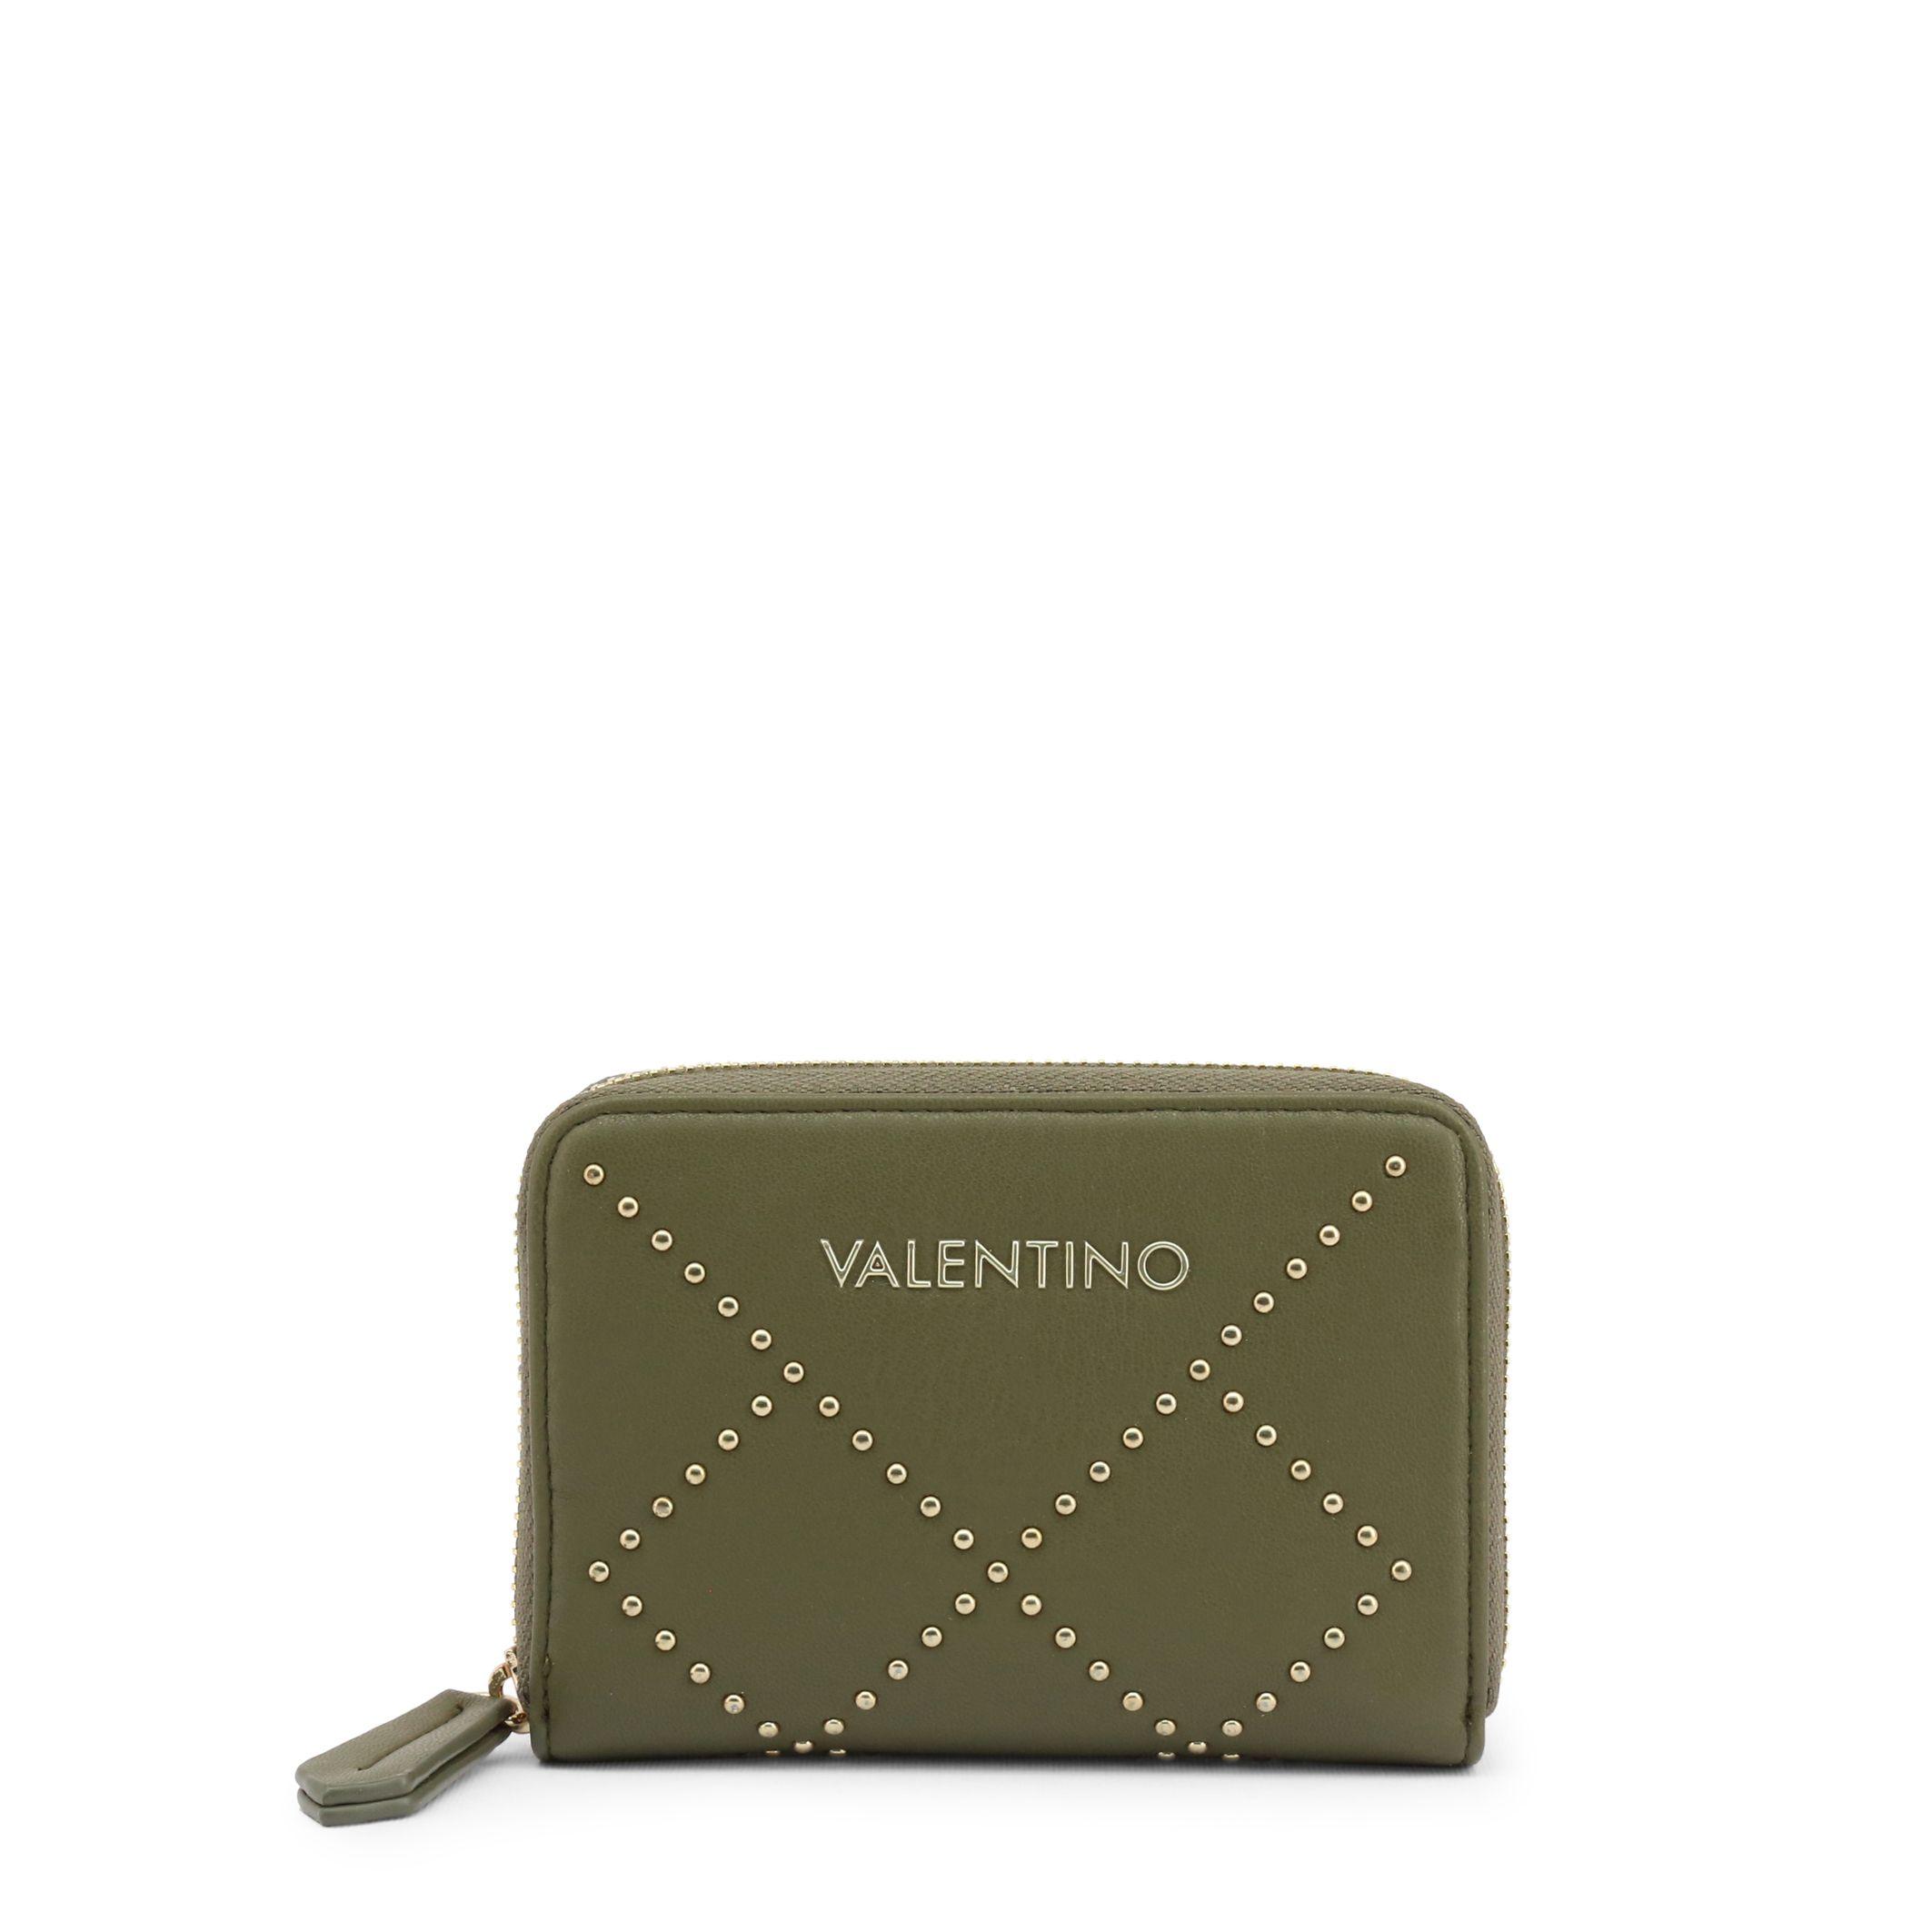 Valentino by Mario Valentino - MANDOLINO-VPS3KI137